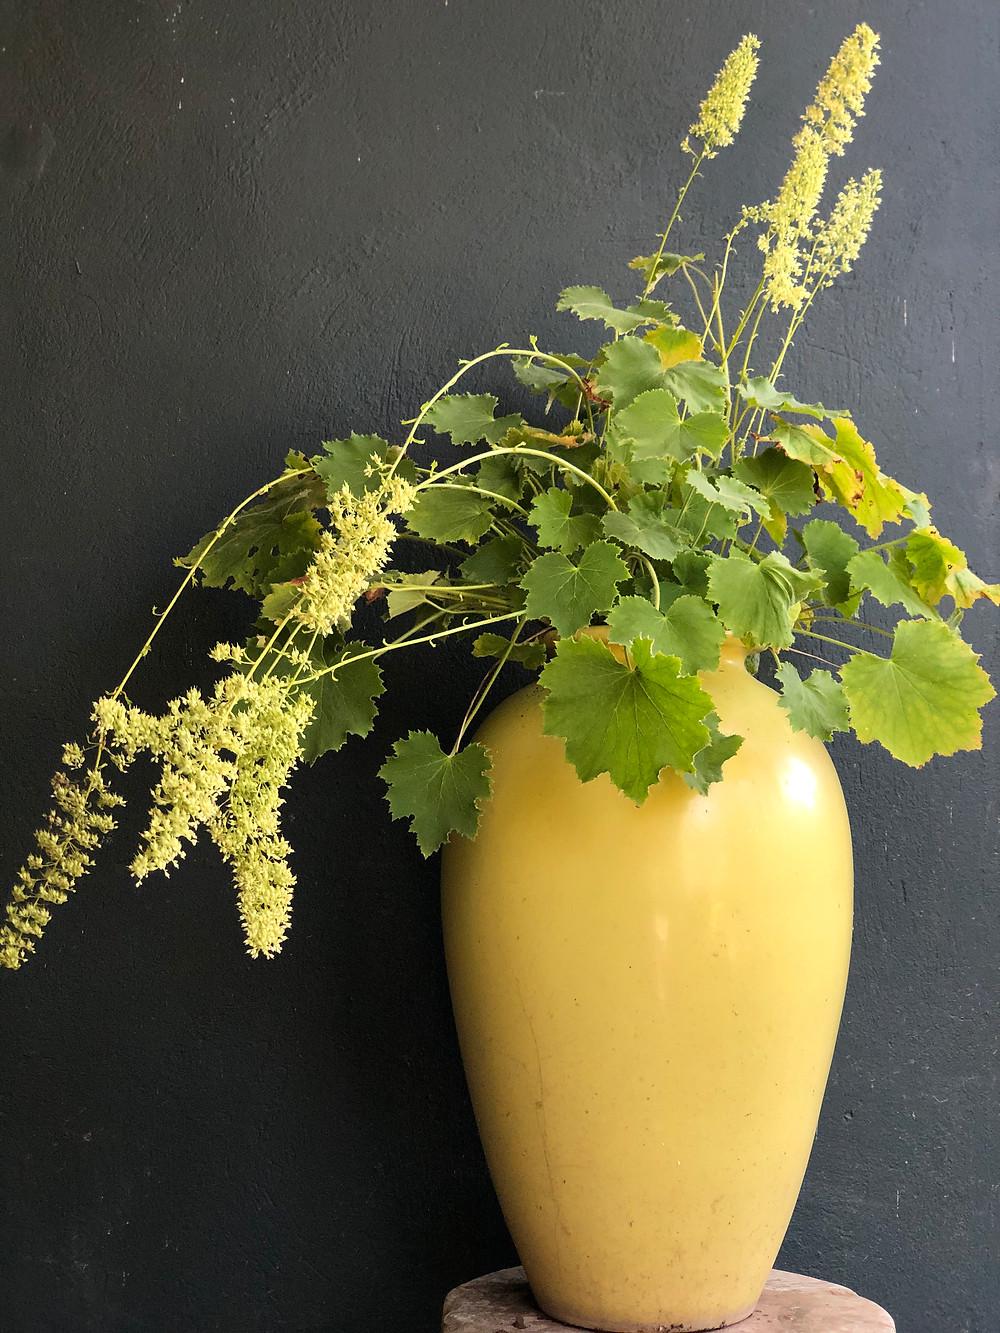 native plant heuchera 'autumn bride' in container